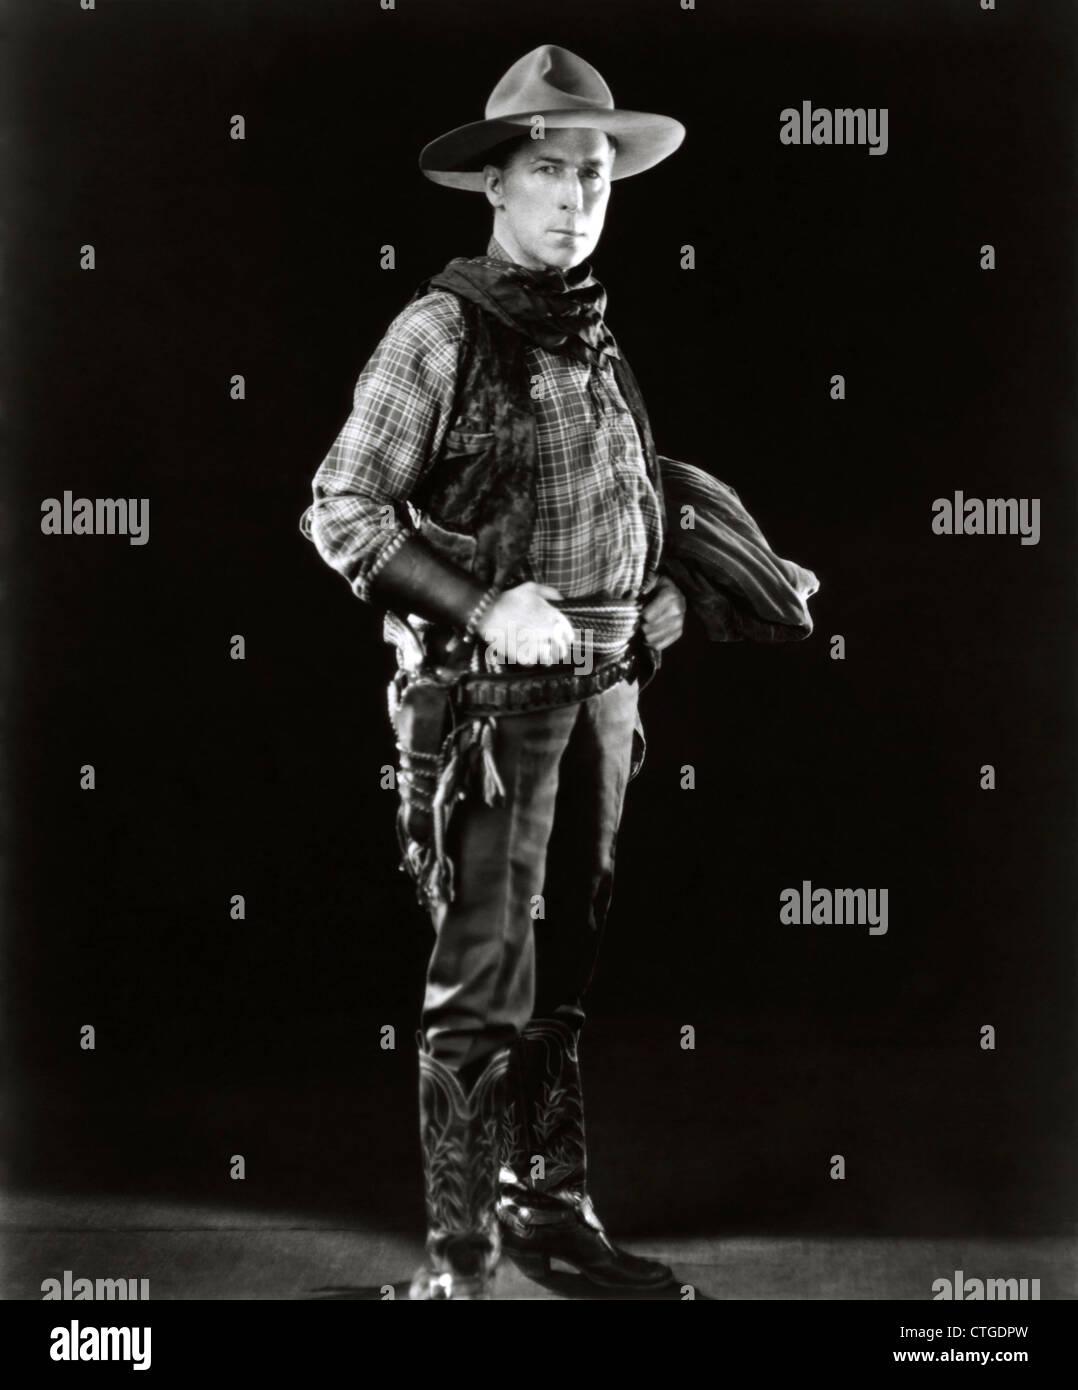 WILLIAM S HART (PORTRAIT) 002 MOVIESTORE COLLECTION LTD - Stock Image